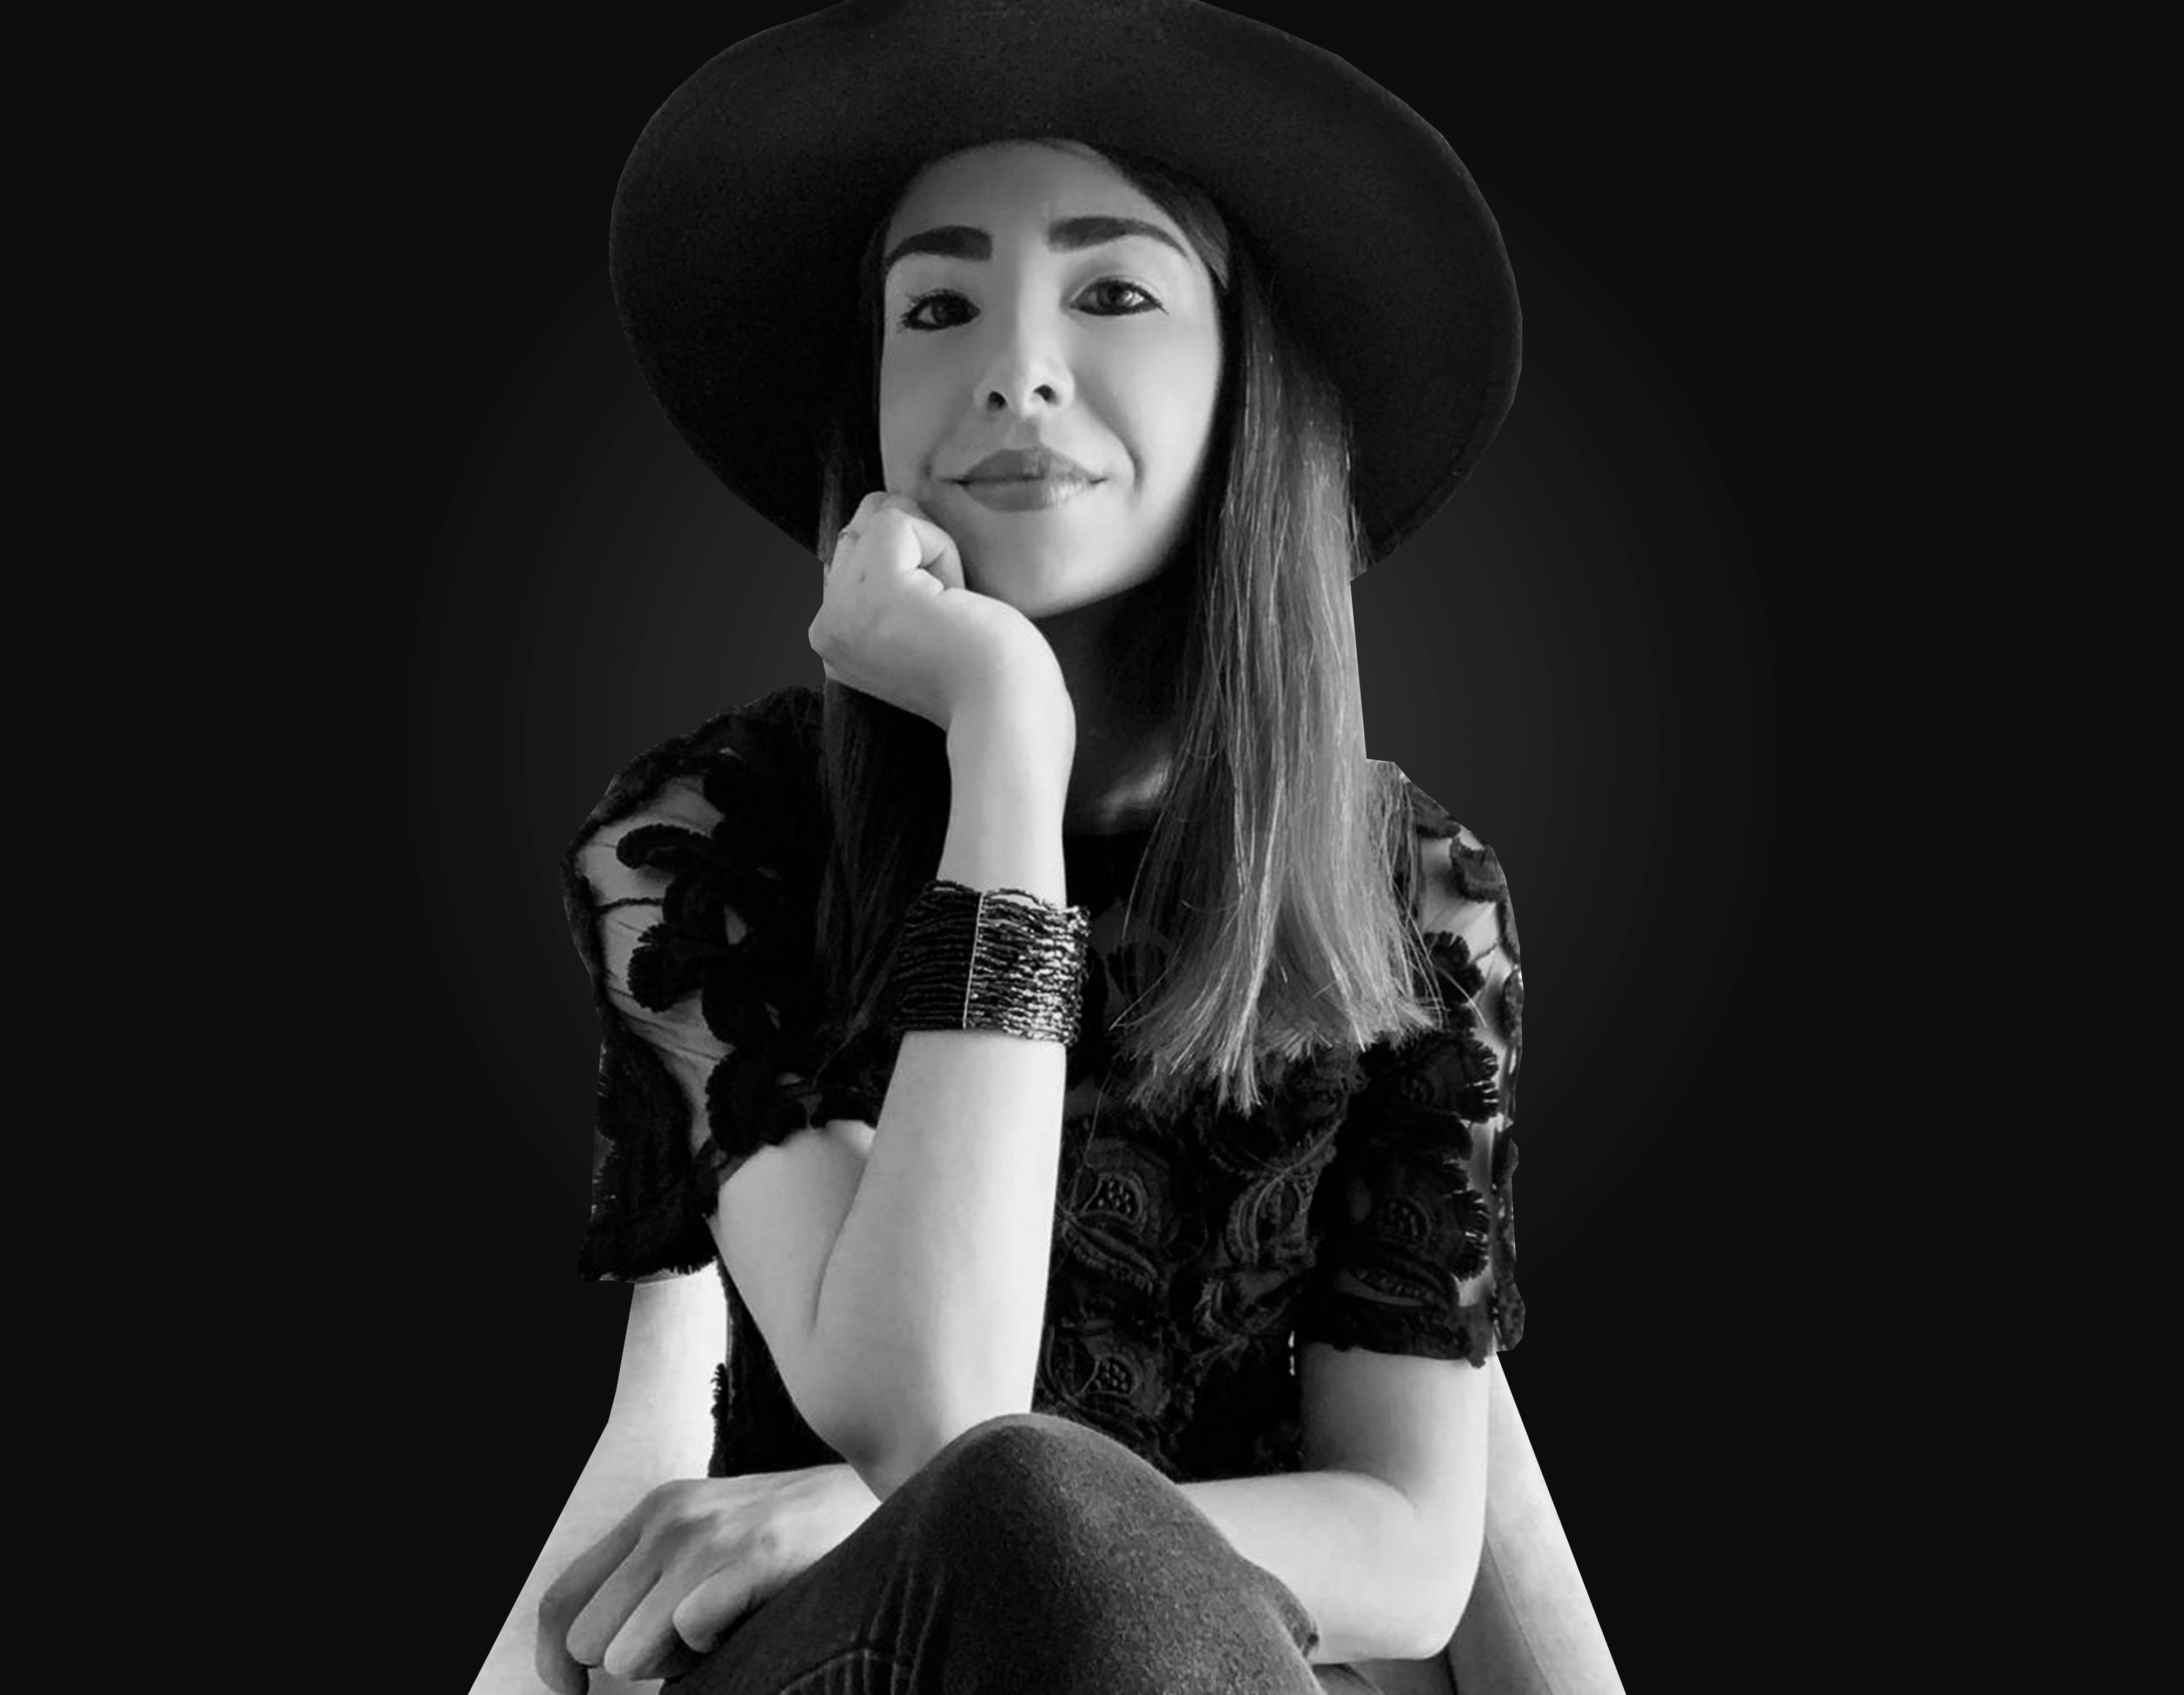 Marce Villaseñor